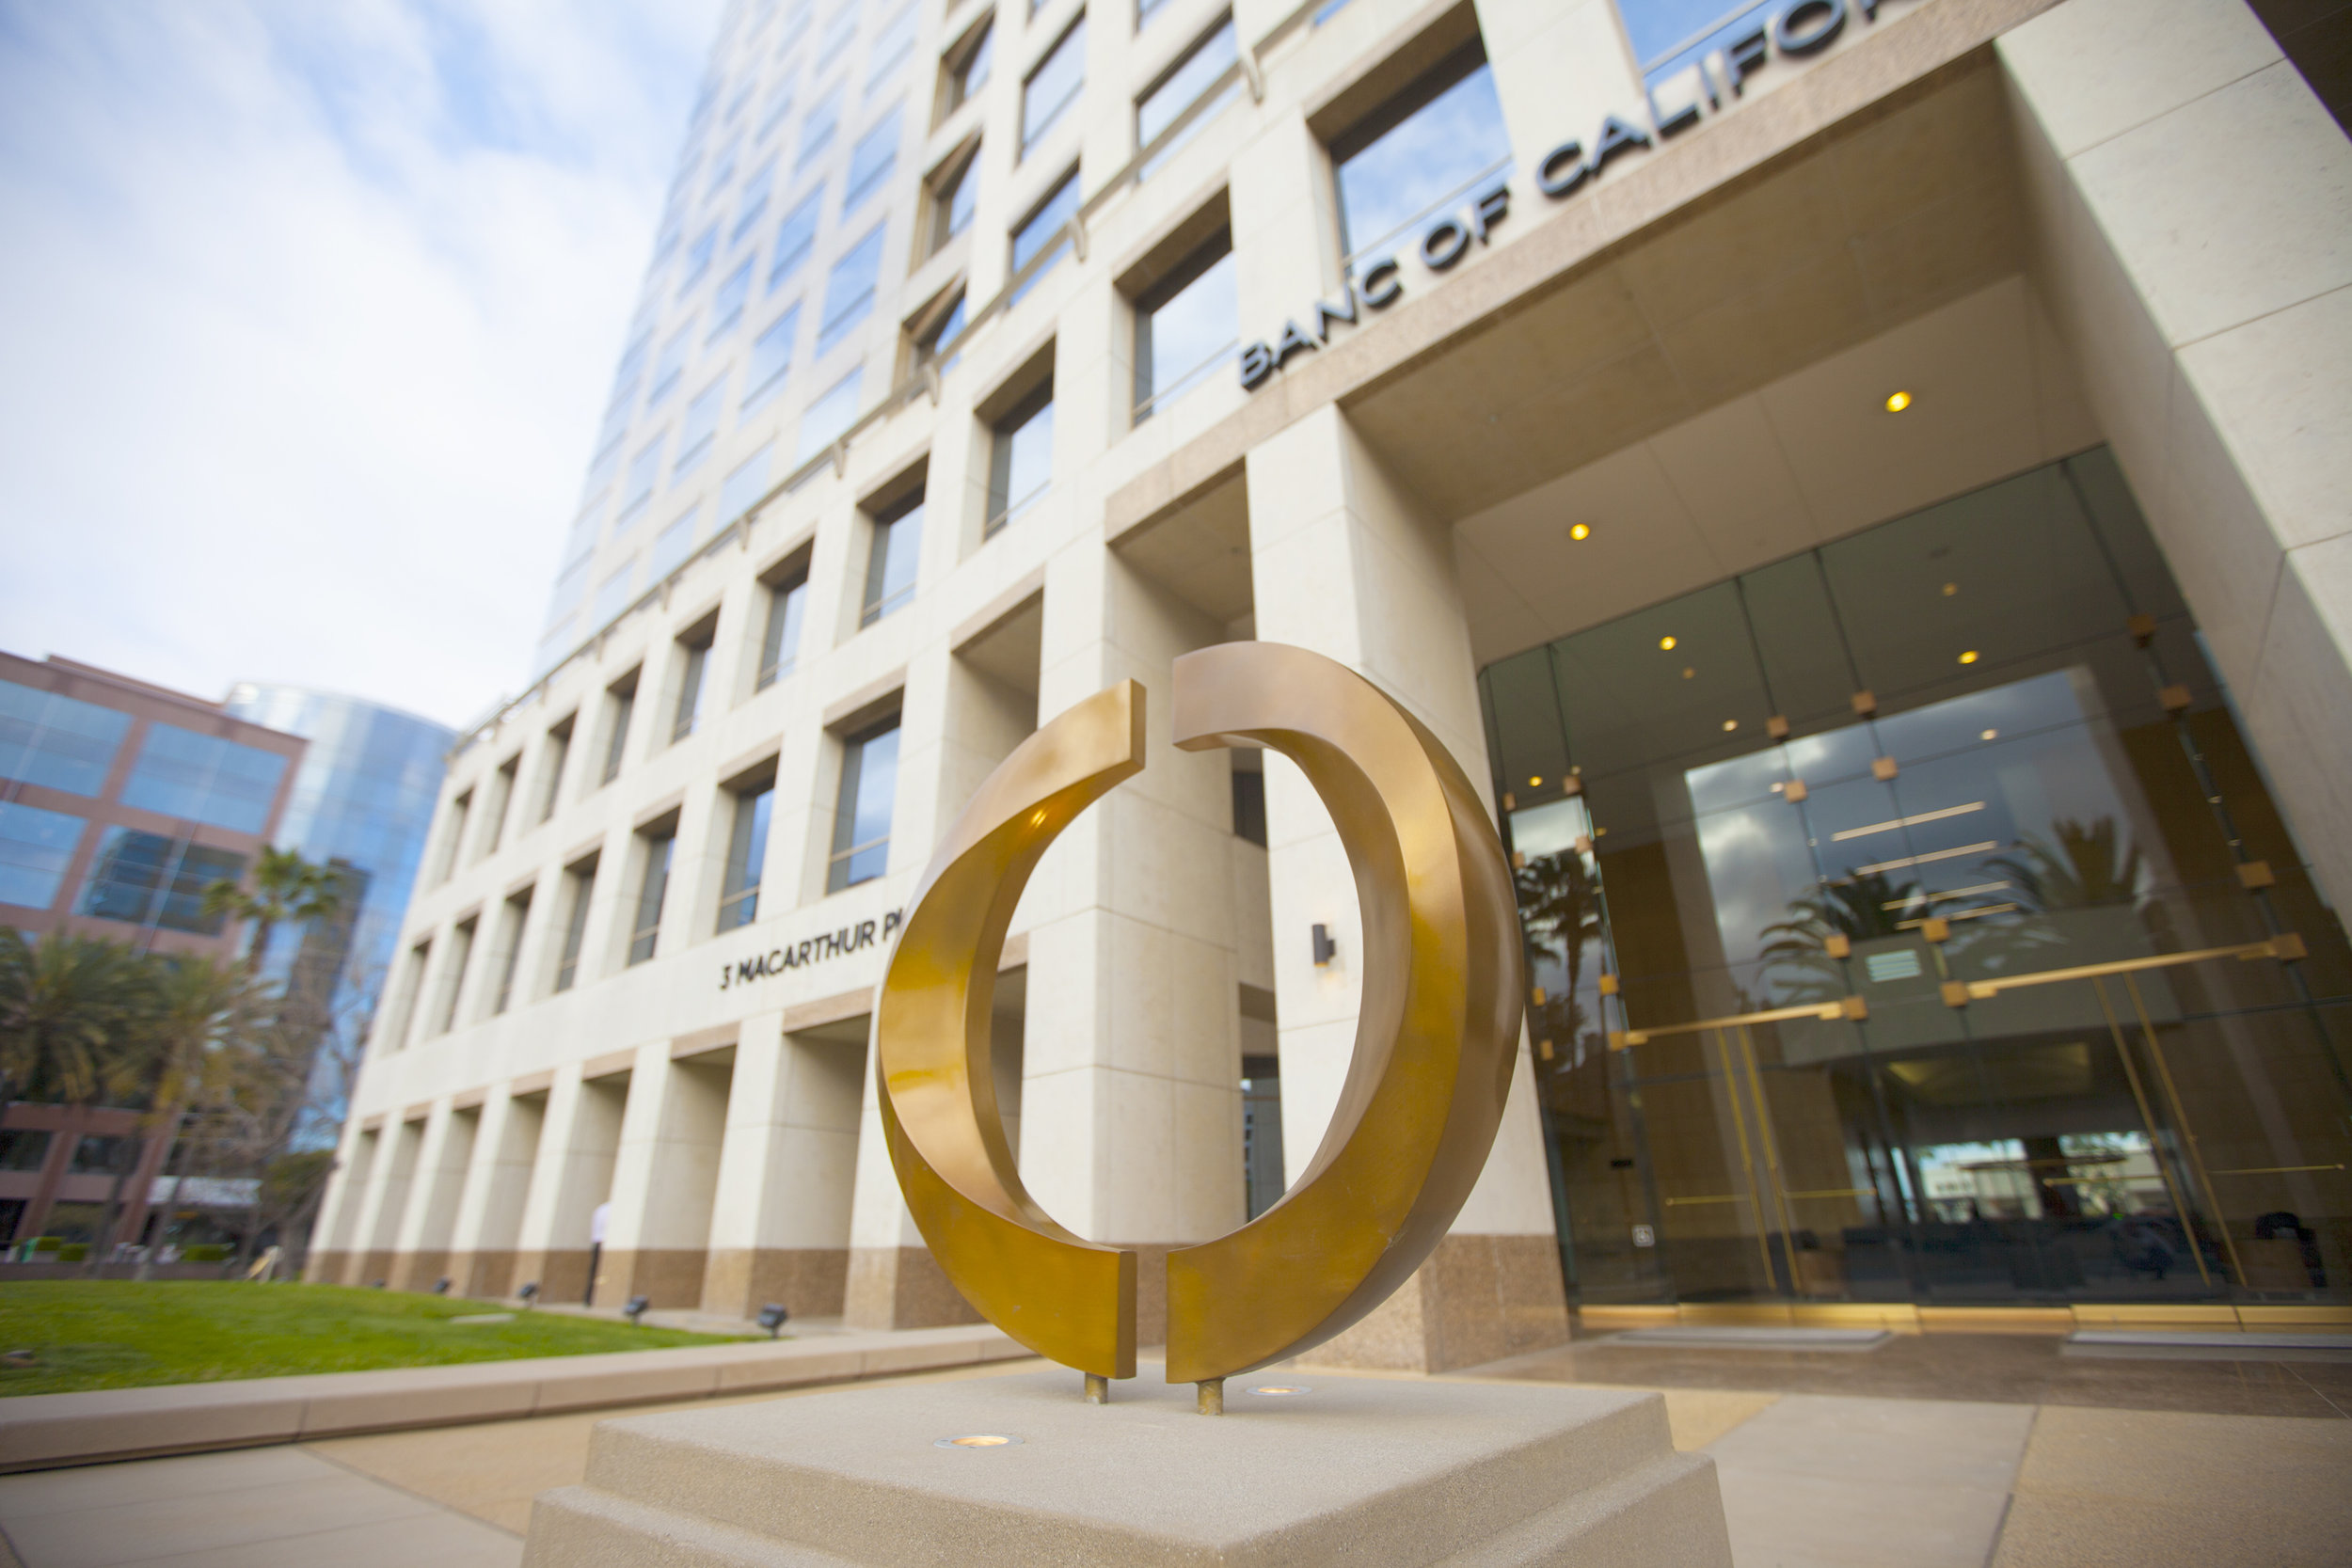 Bronze Sculpture for Banc of California Headquarters, Santa Ana, Ca. 2017. // Sculptor: Jake Janz Fine Art // Architect:  Gensler  // Contractor:  Howard Building Co.